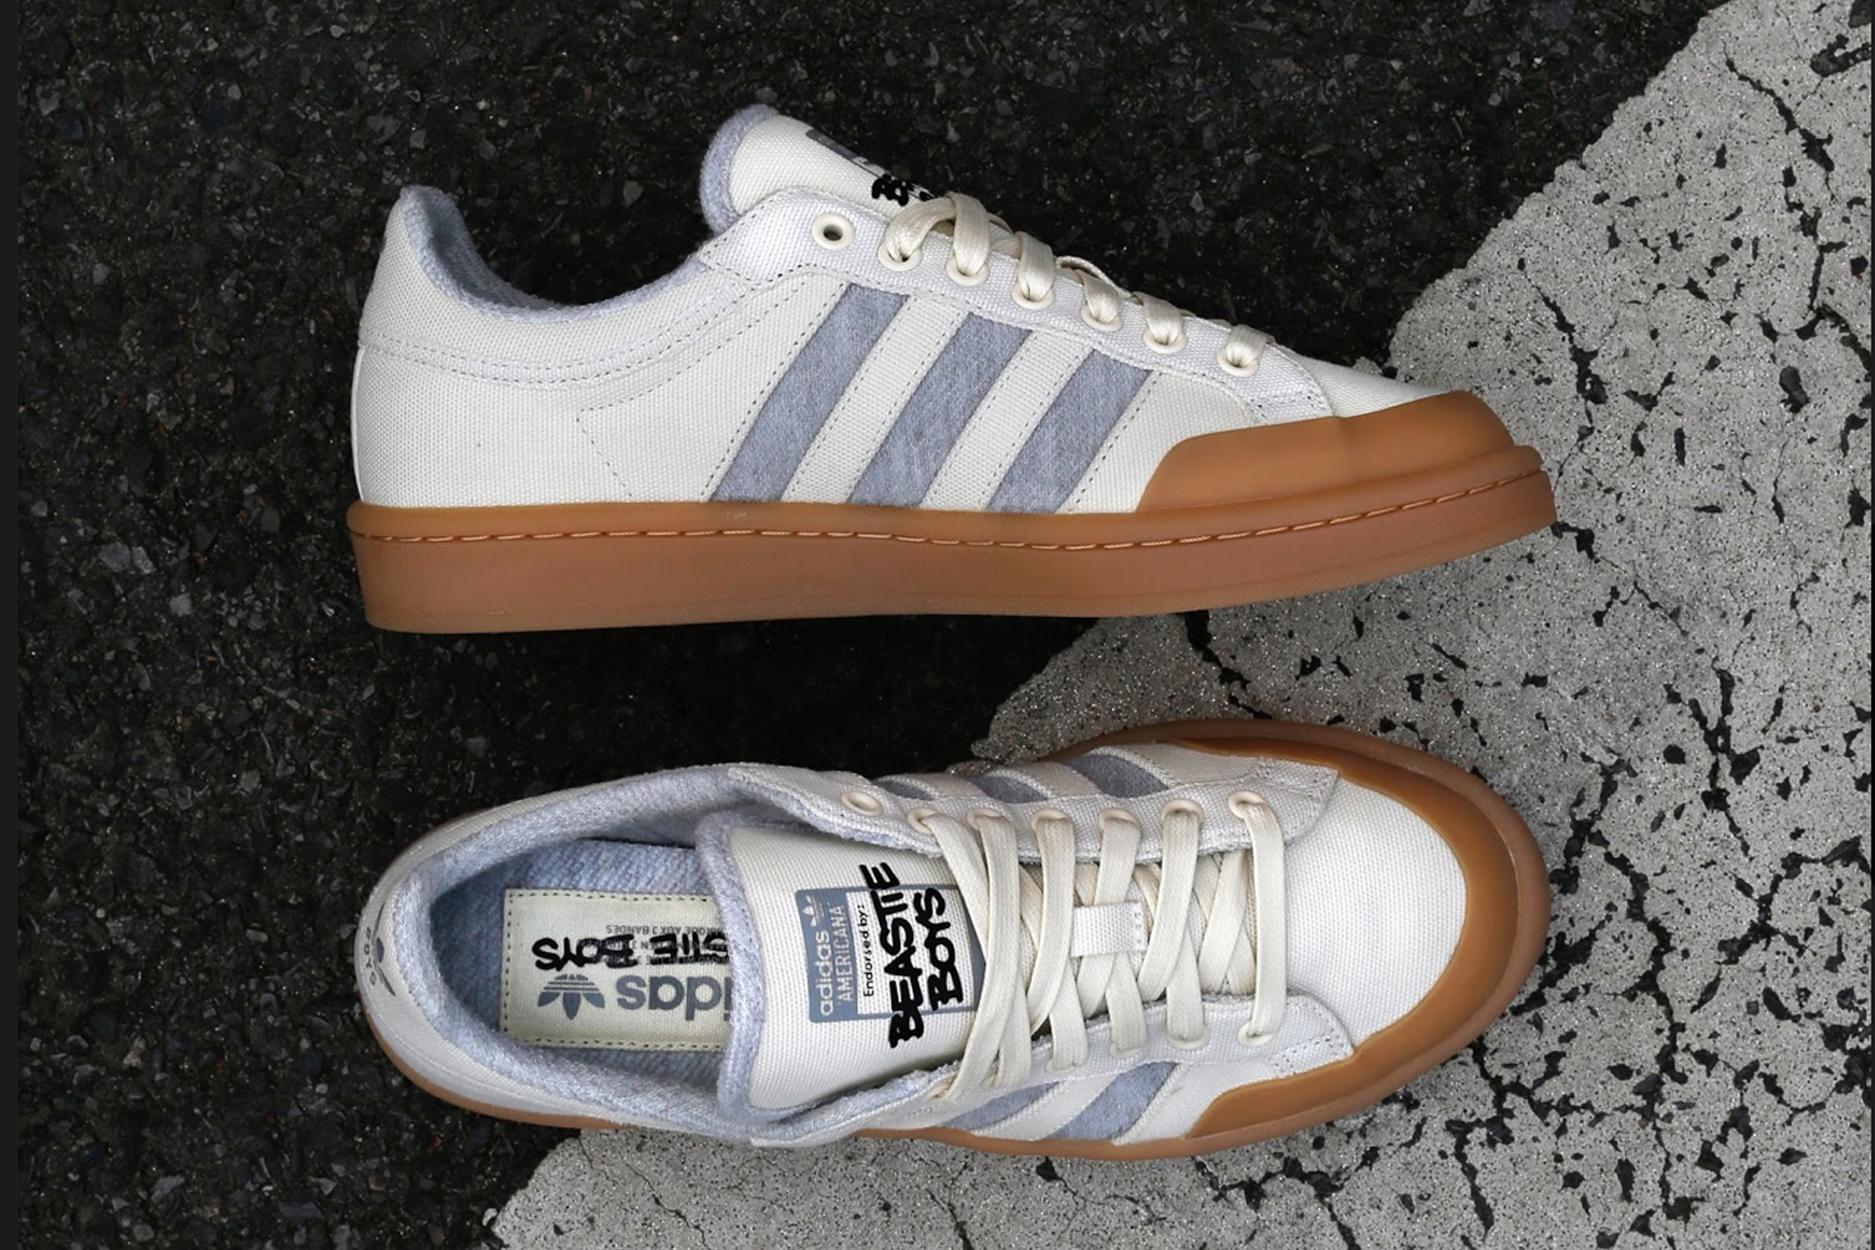 Adidas Skateboarding Commemorates the